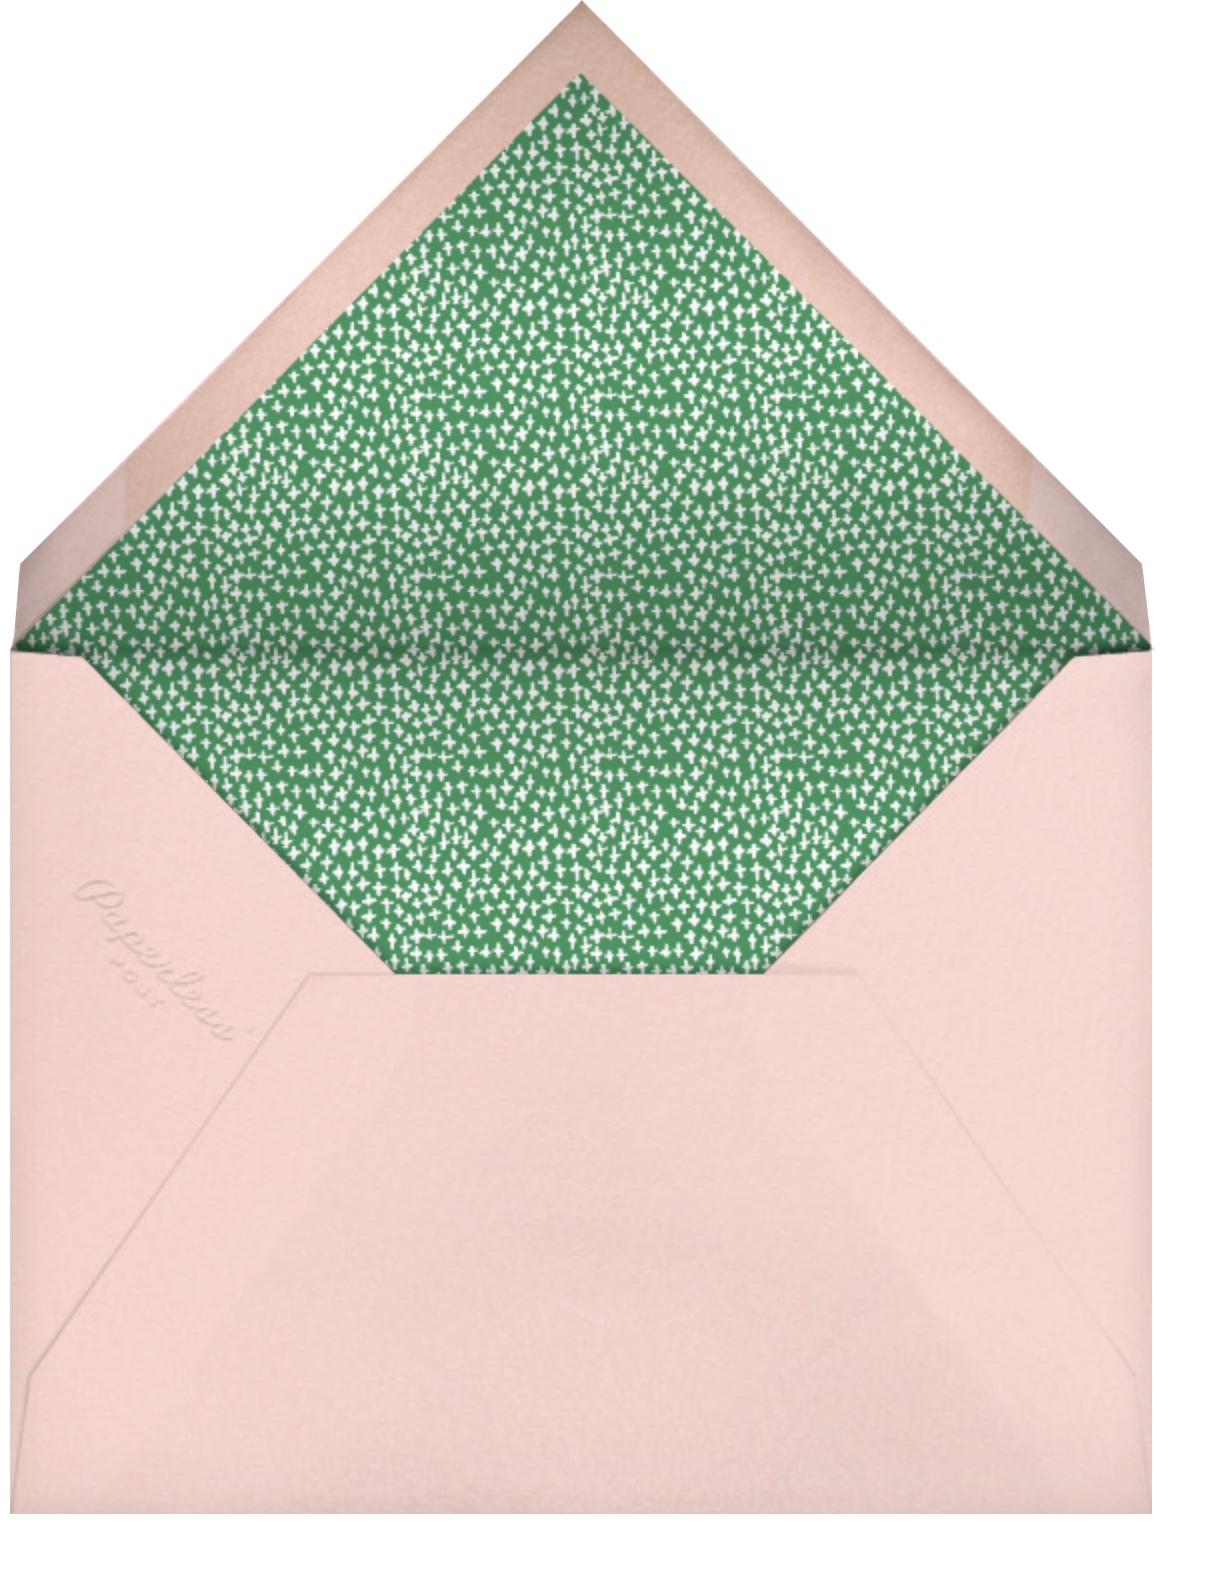 Oh Printemps - Mr. Boddington's Studio - Save the date - envelope back